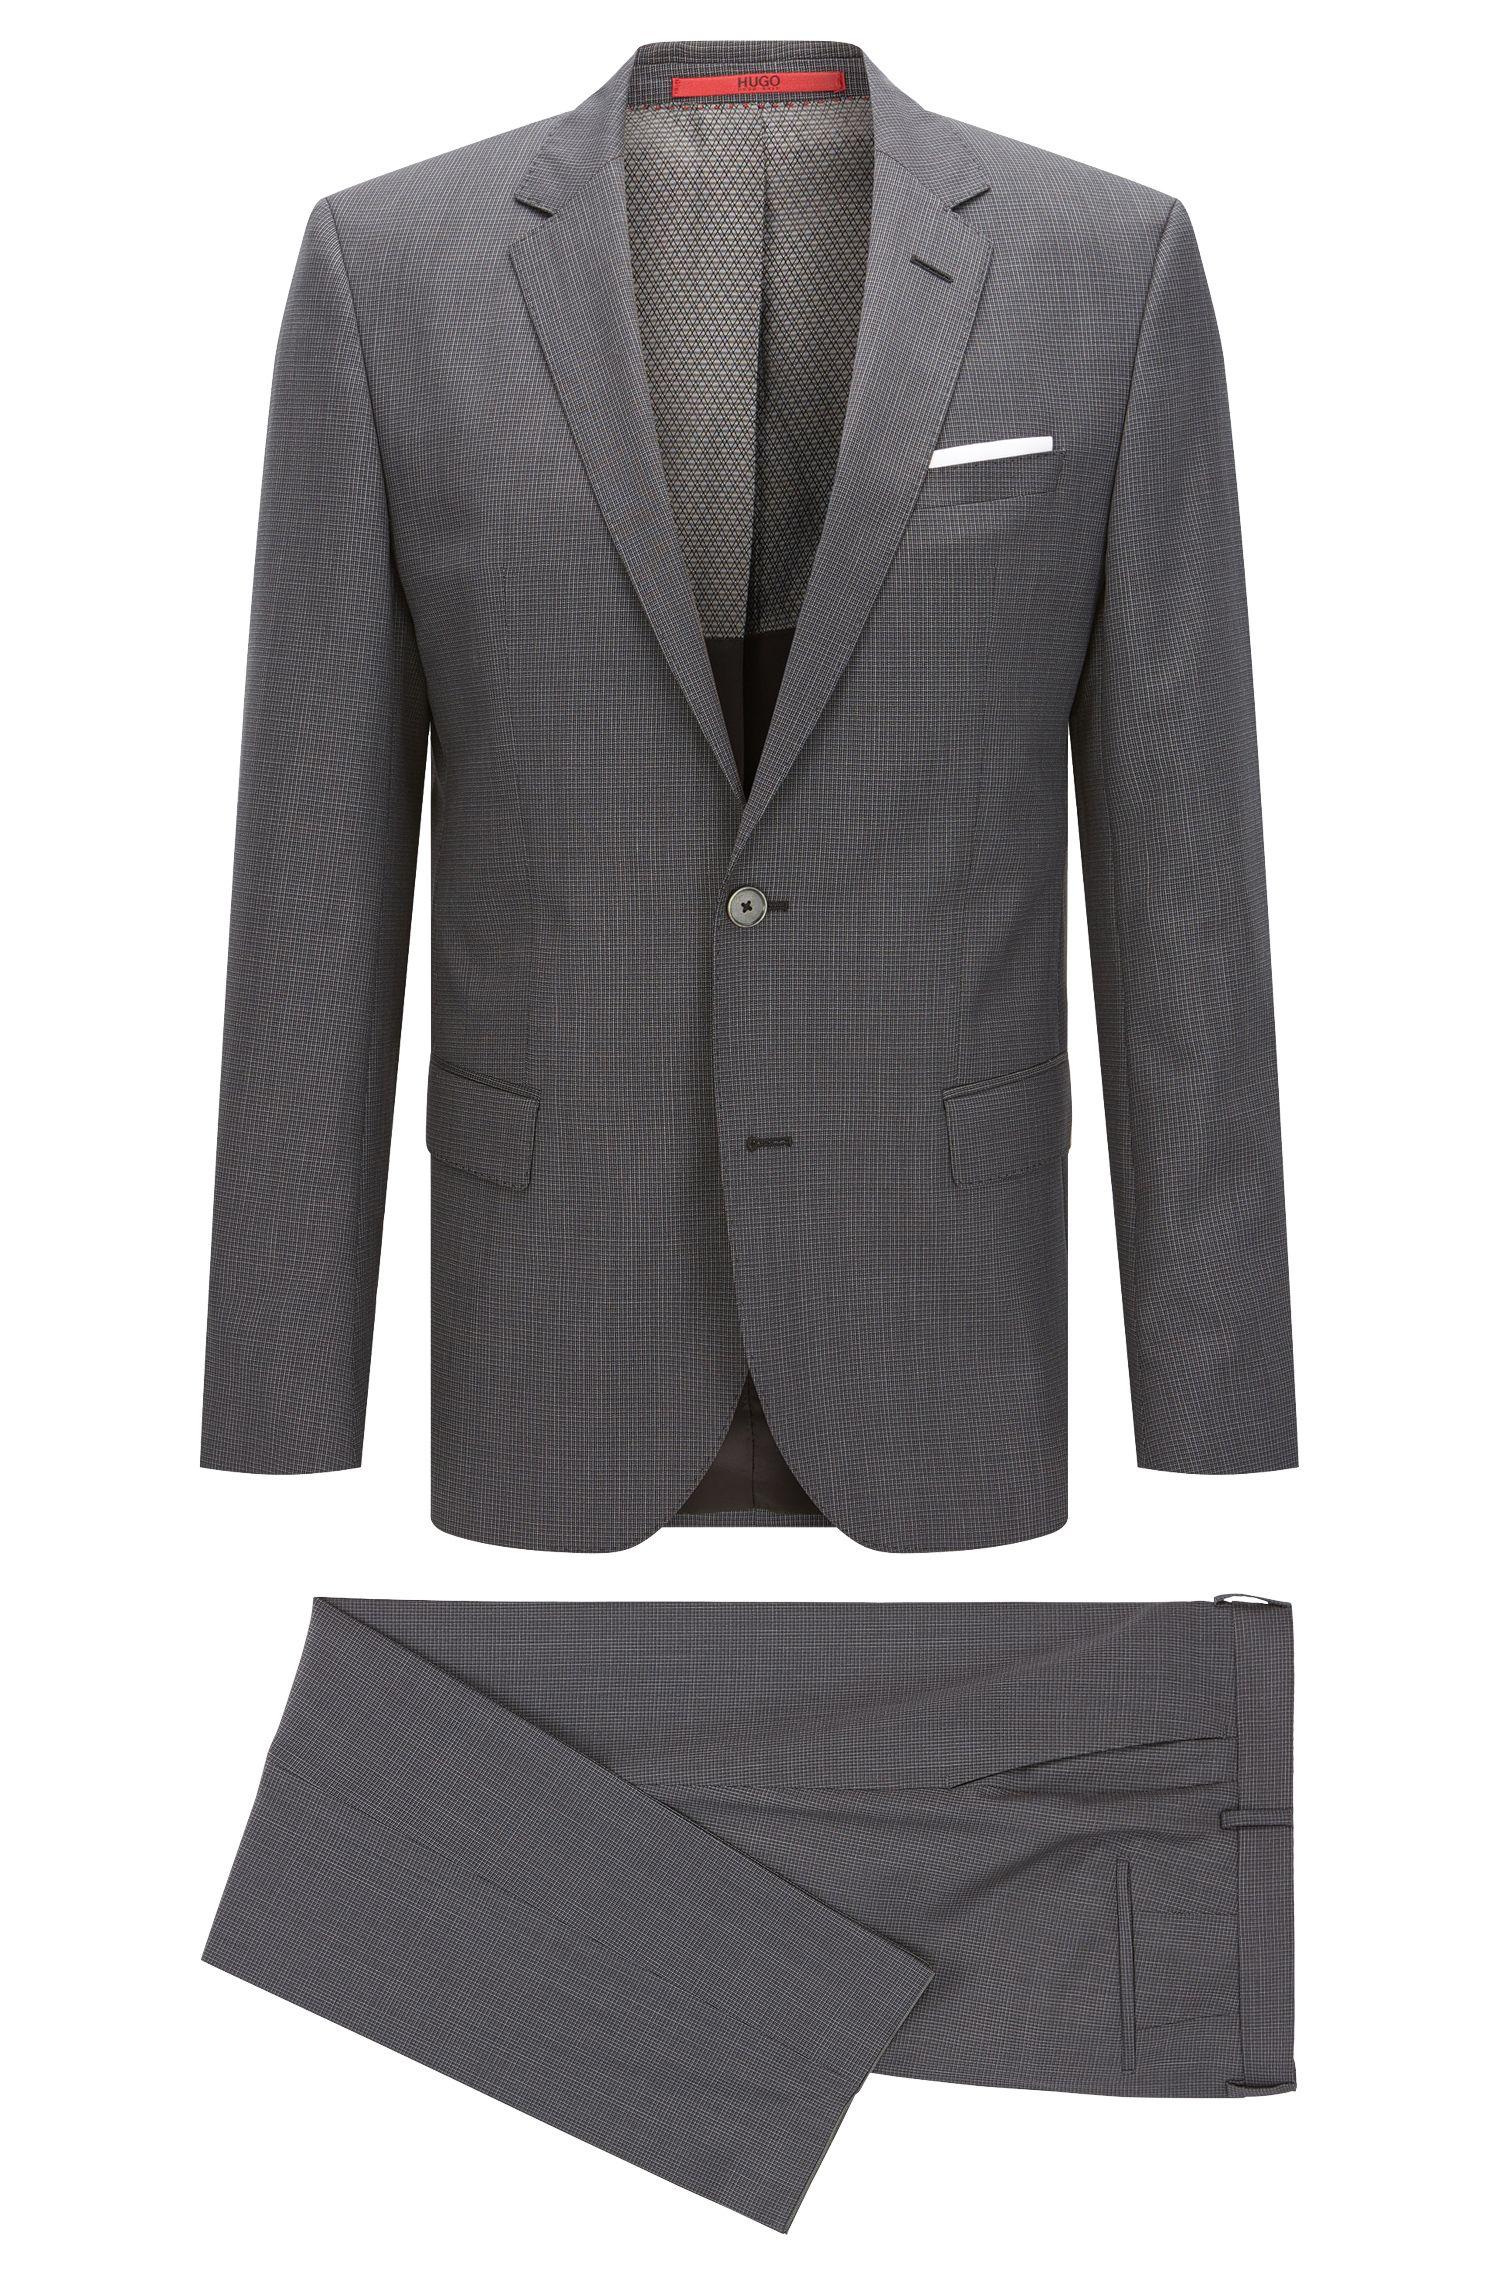 Textured Check Virgin Wool Blend Suit, Slim Fit  C-Hutson/C-Gander